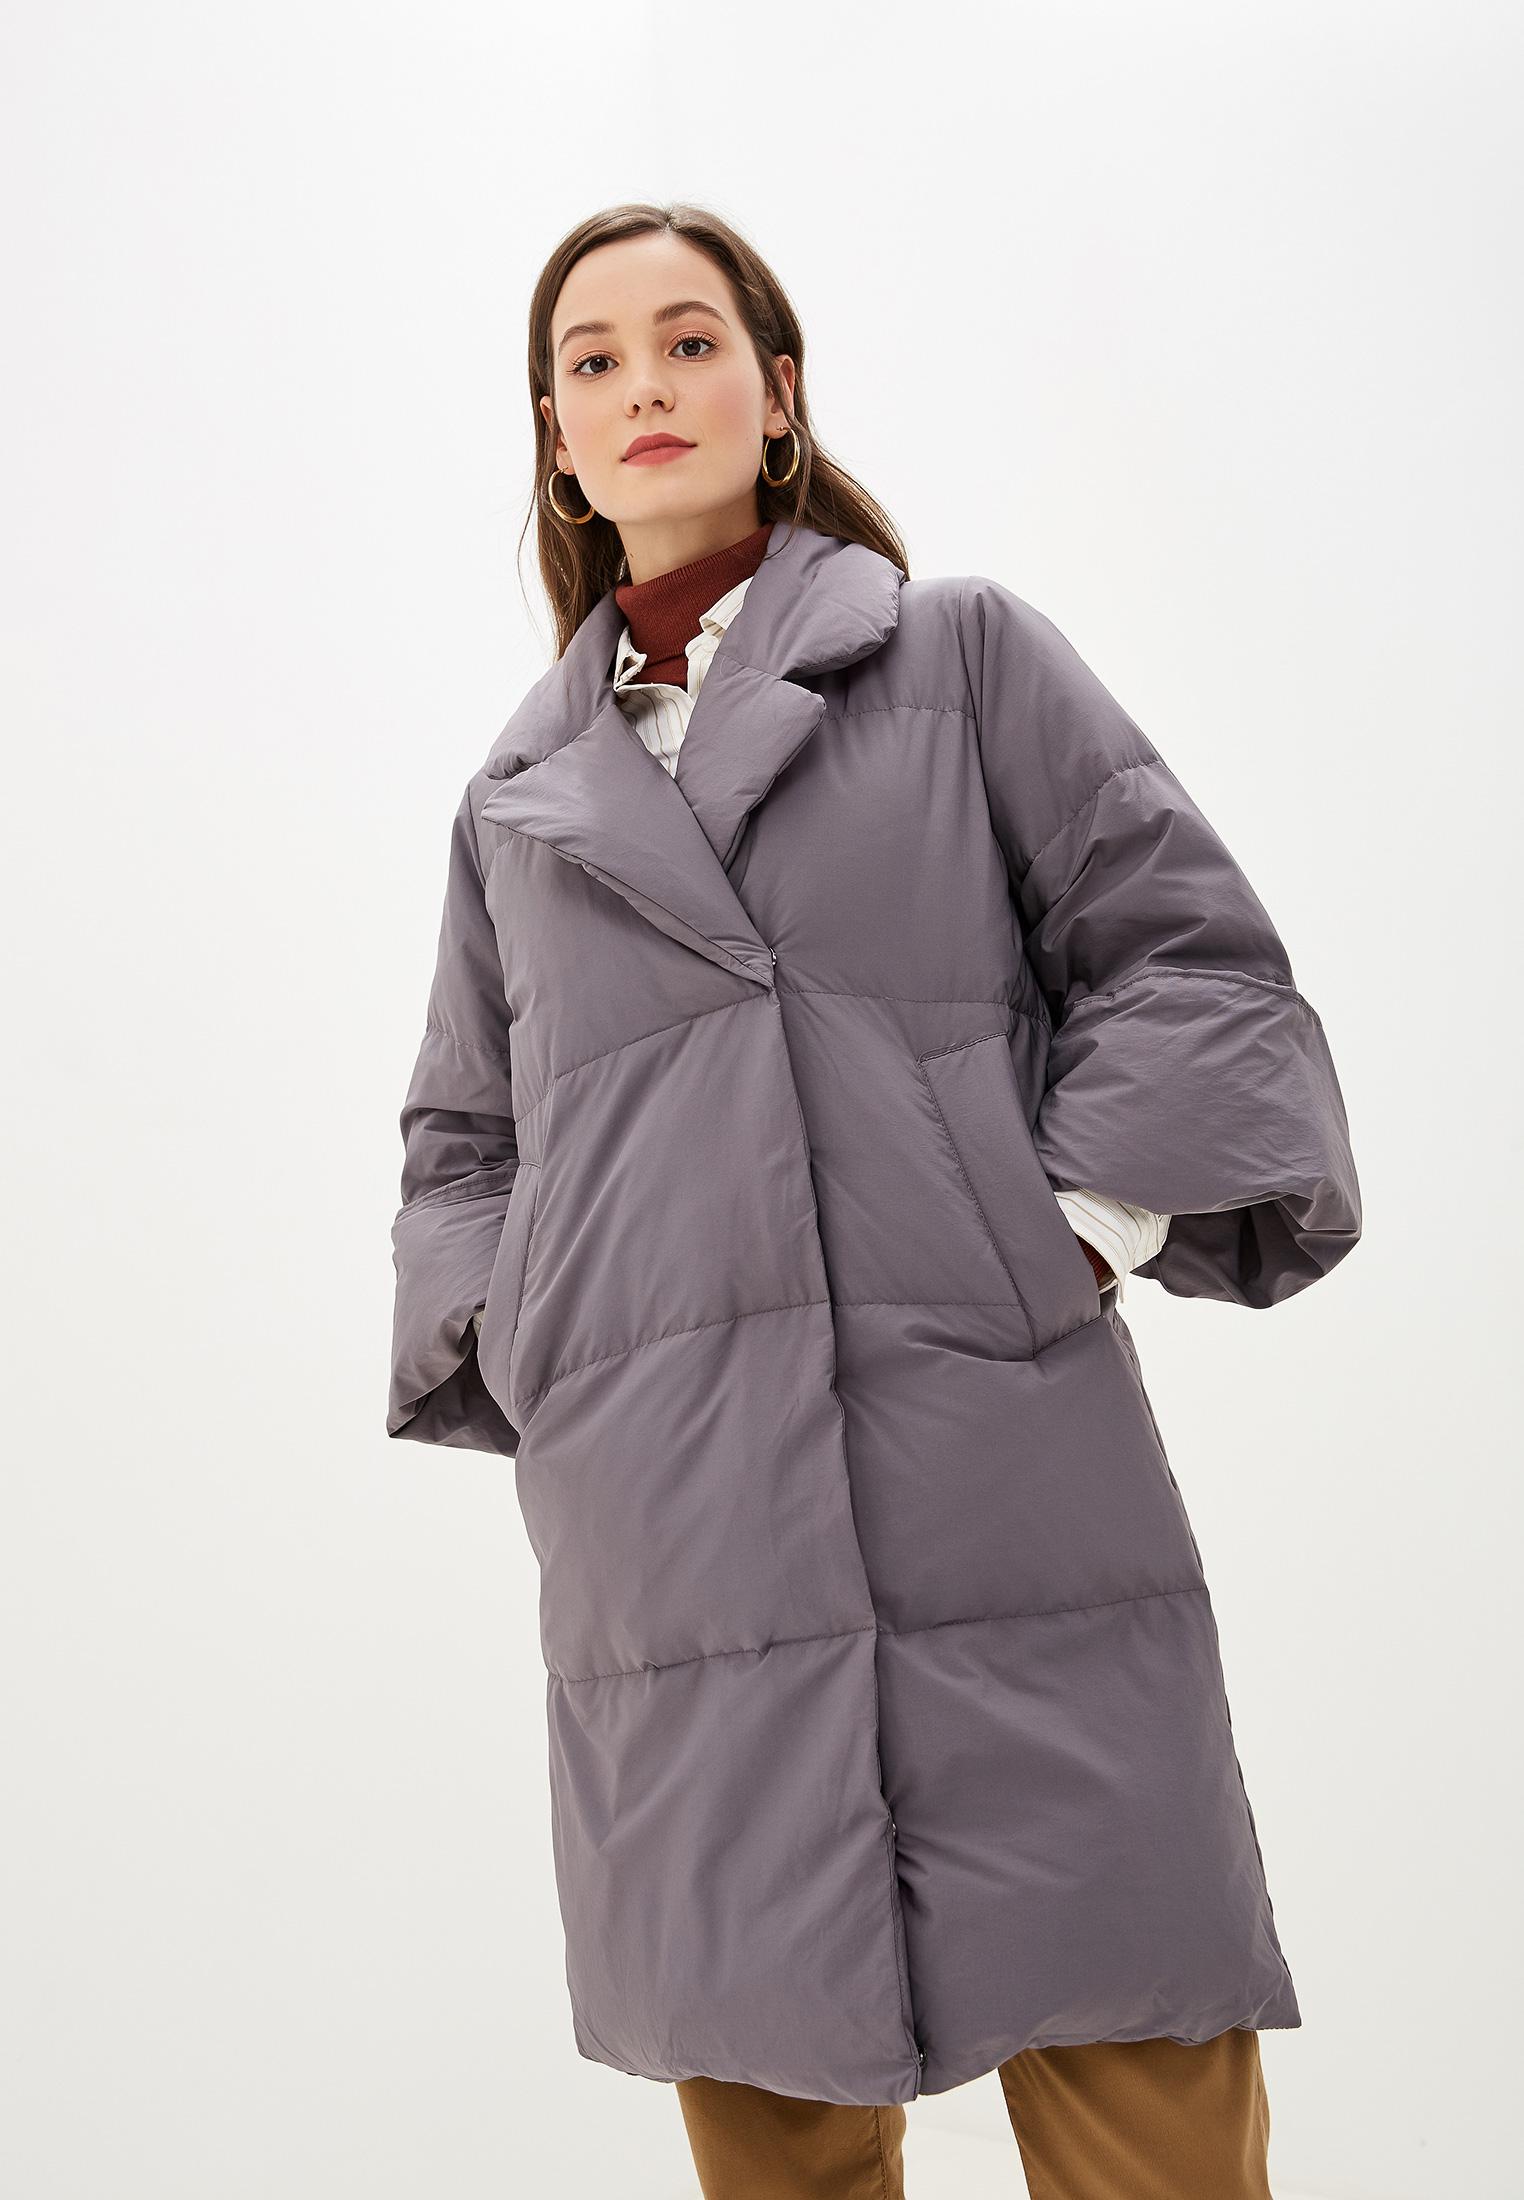 Пуховик, Savage, цвет: серый. Артикул: SA004EWGESB0. Одежда / Верхняя одежда / Пуховики и зимние куртки